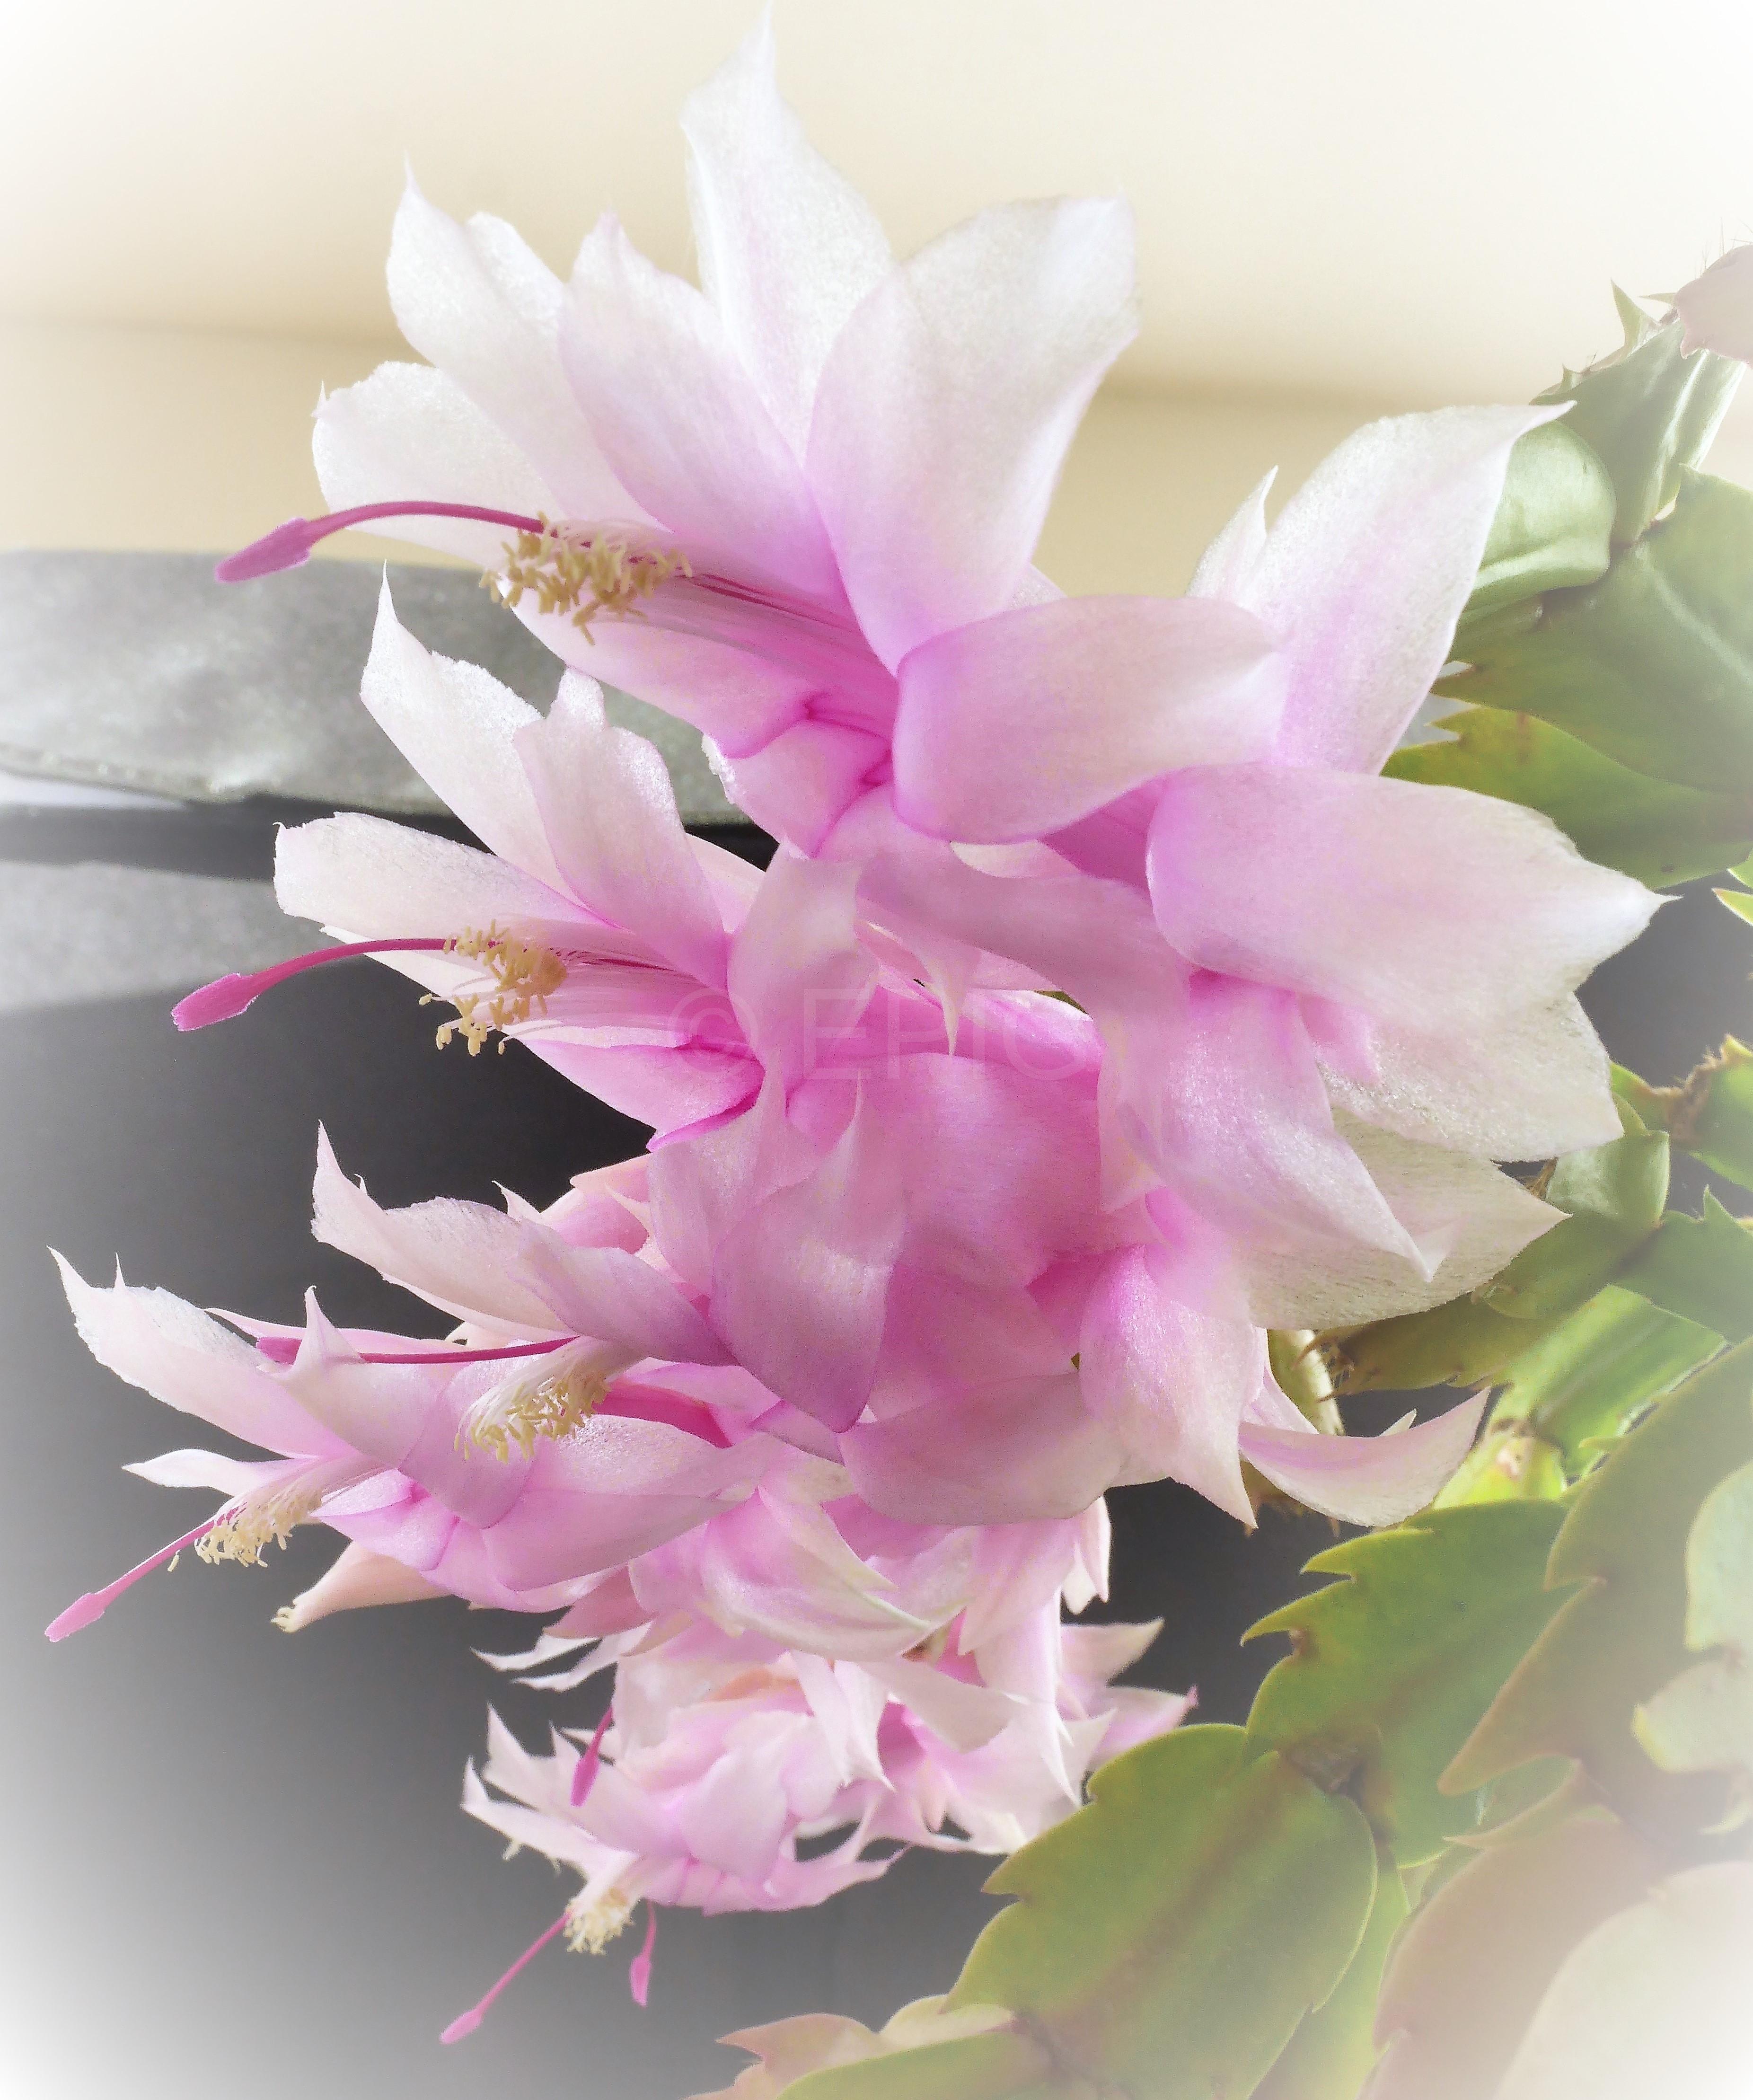 Schlumbergera x reginae 'Swan Lake' (Foto Ruud Tropper)